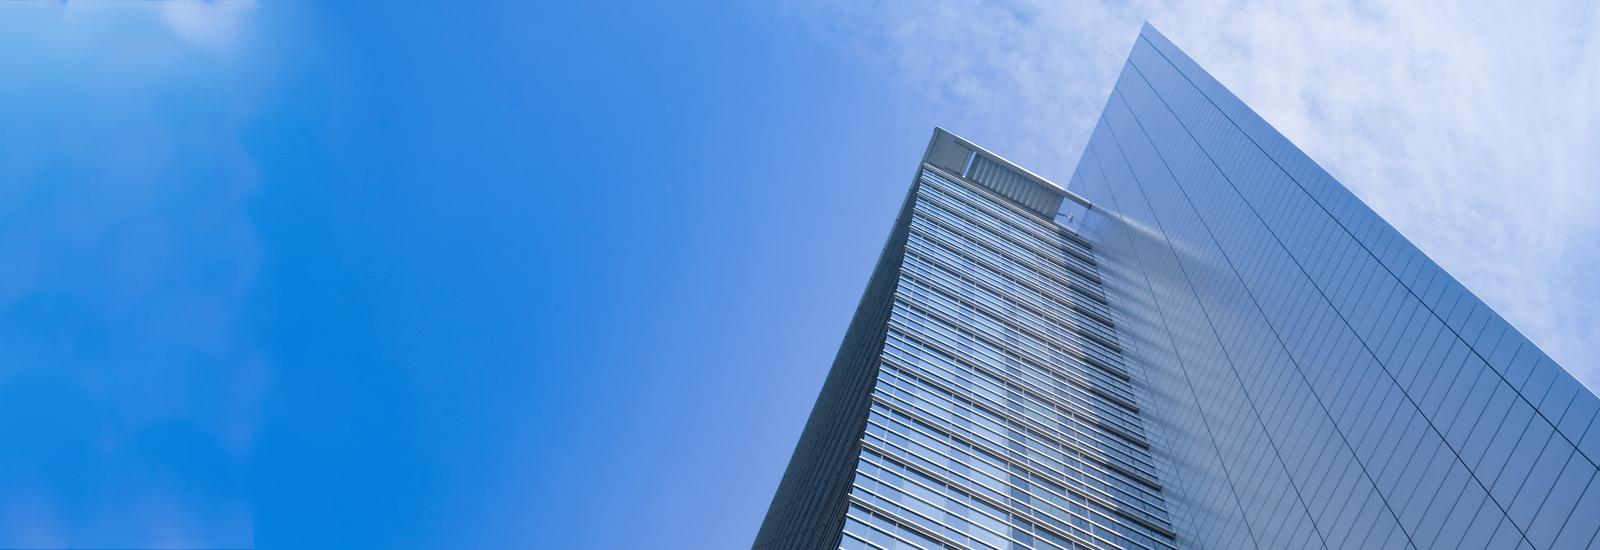 fm.benchmarking Bericht 2018